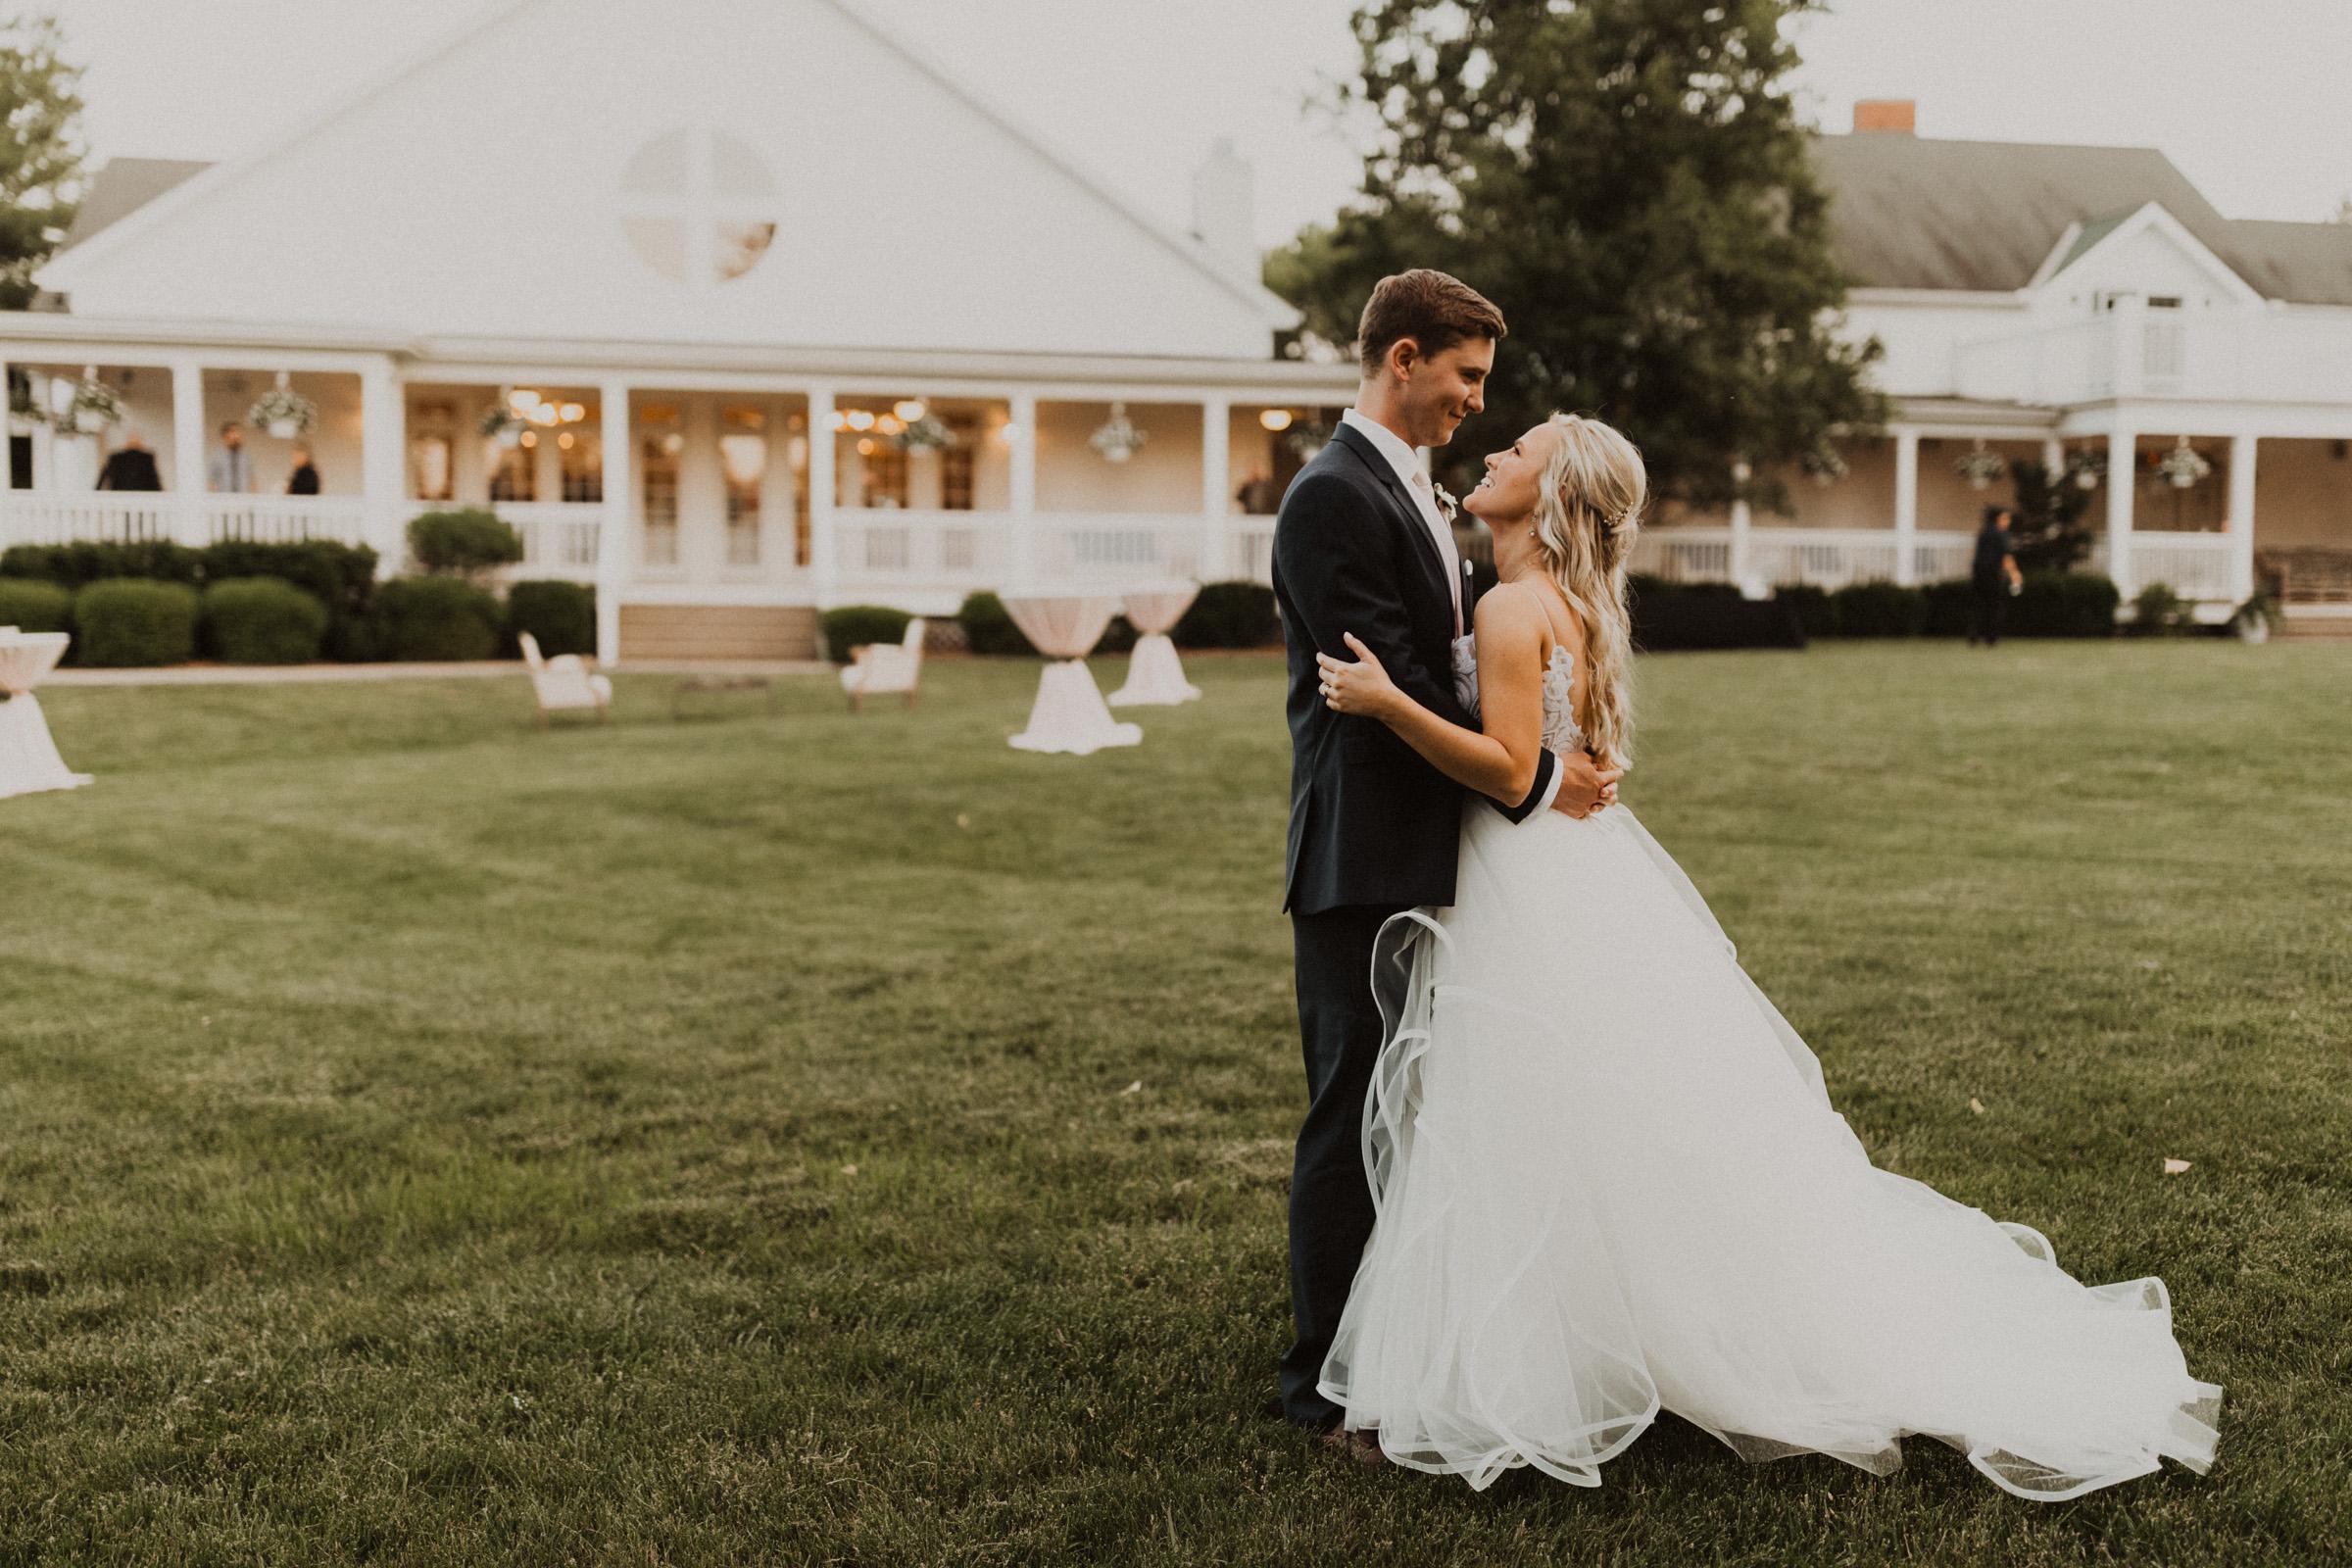 alyssa barletter photography hawthorne house summer outdoor wedding southern charm inspiration-55.jpg